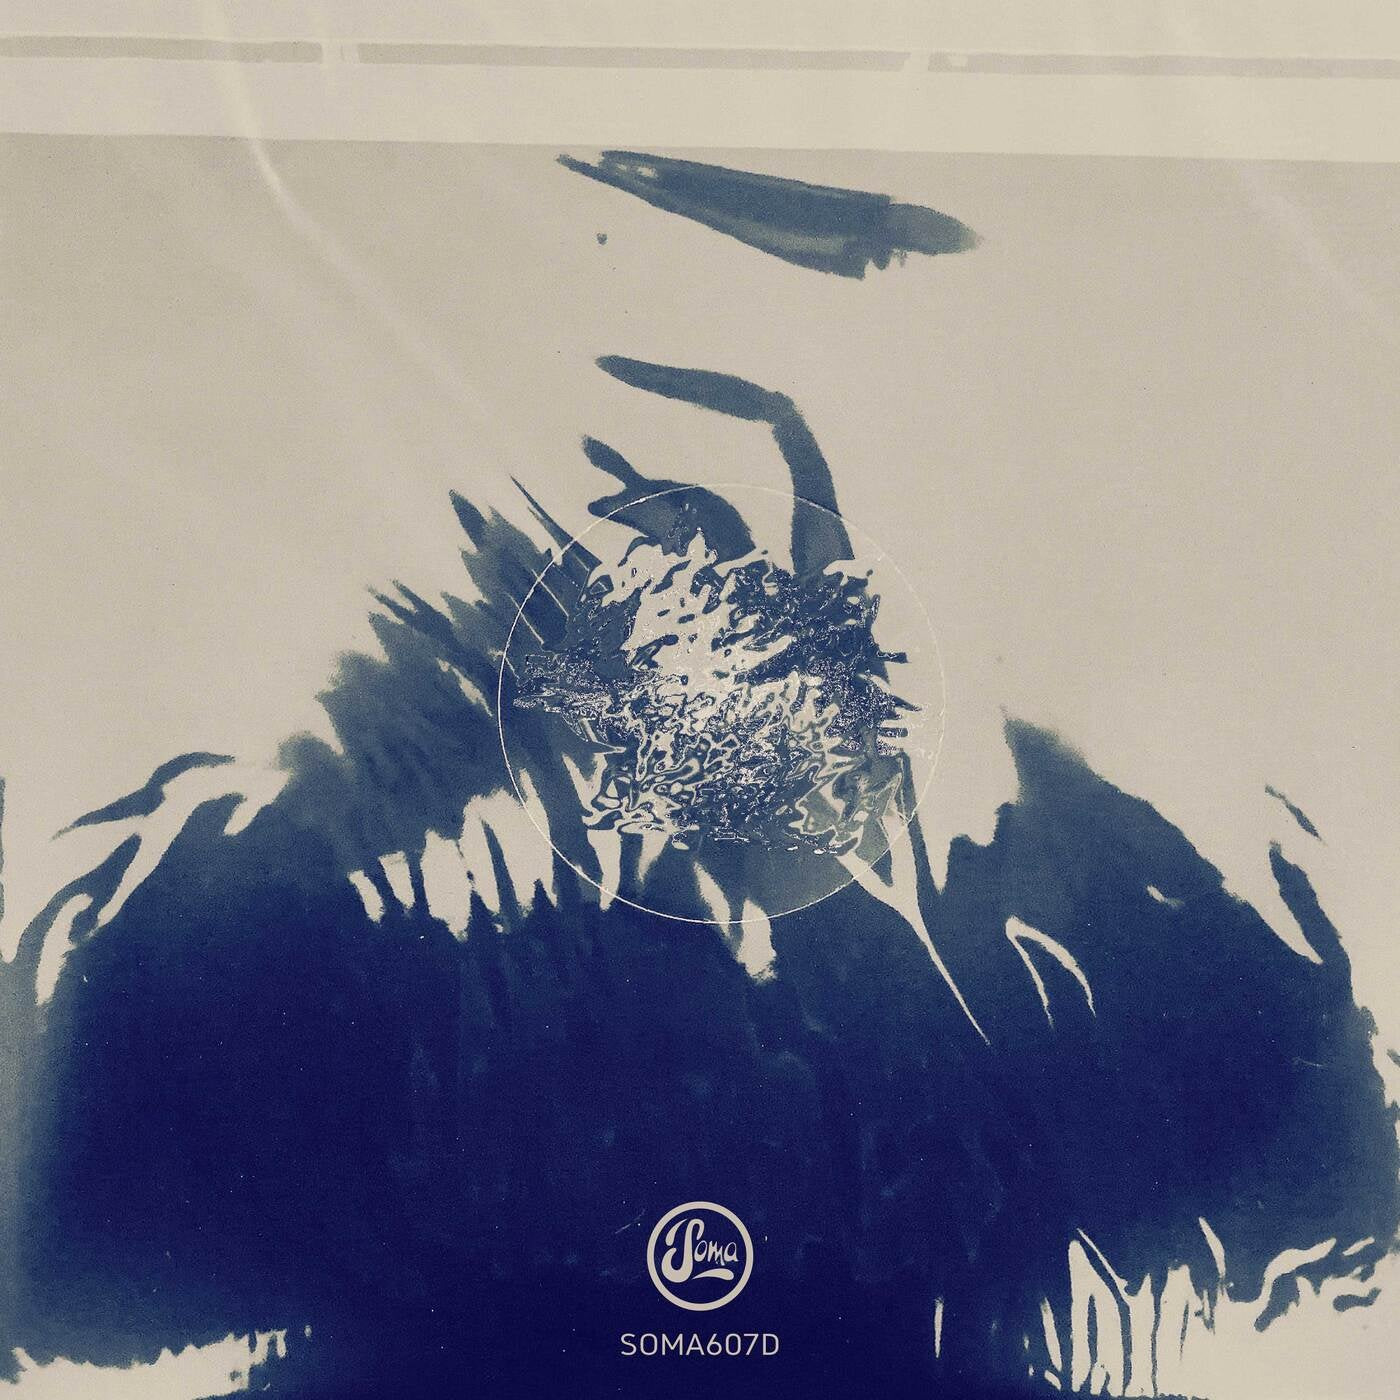 Torres Vedras 8am (Original Mix)